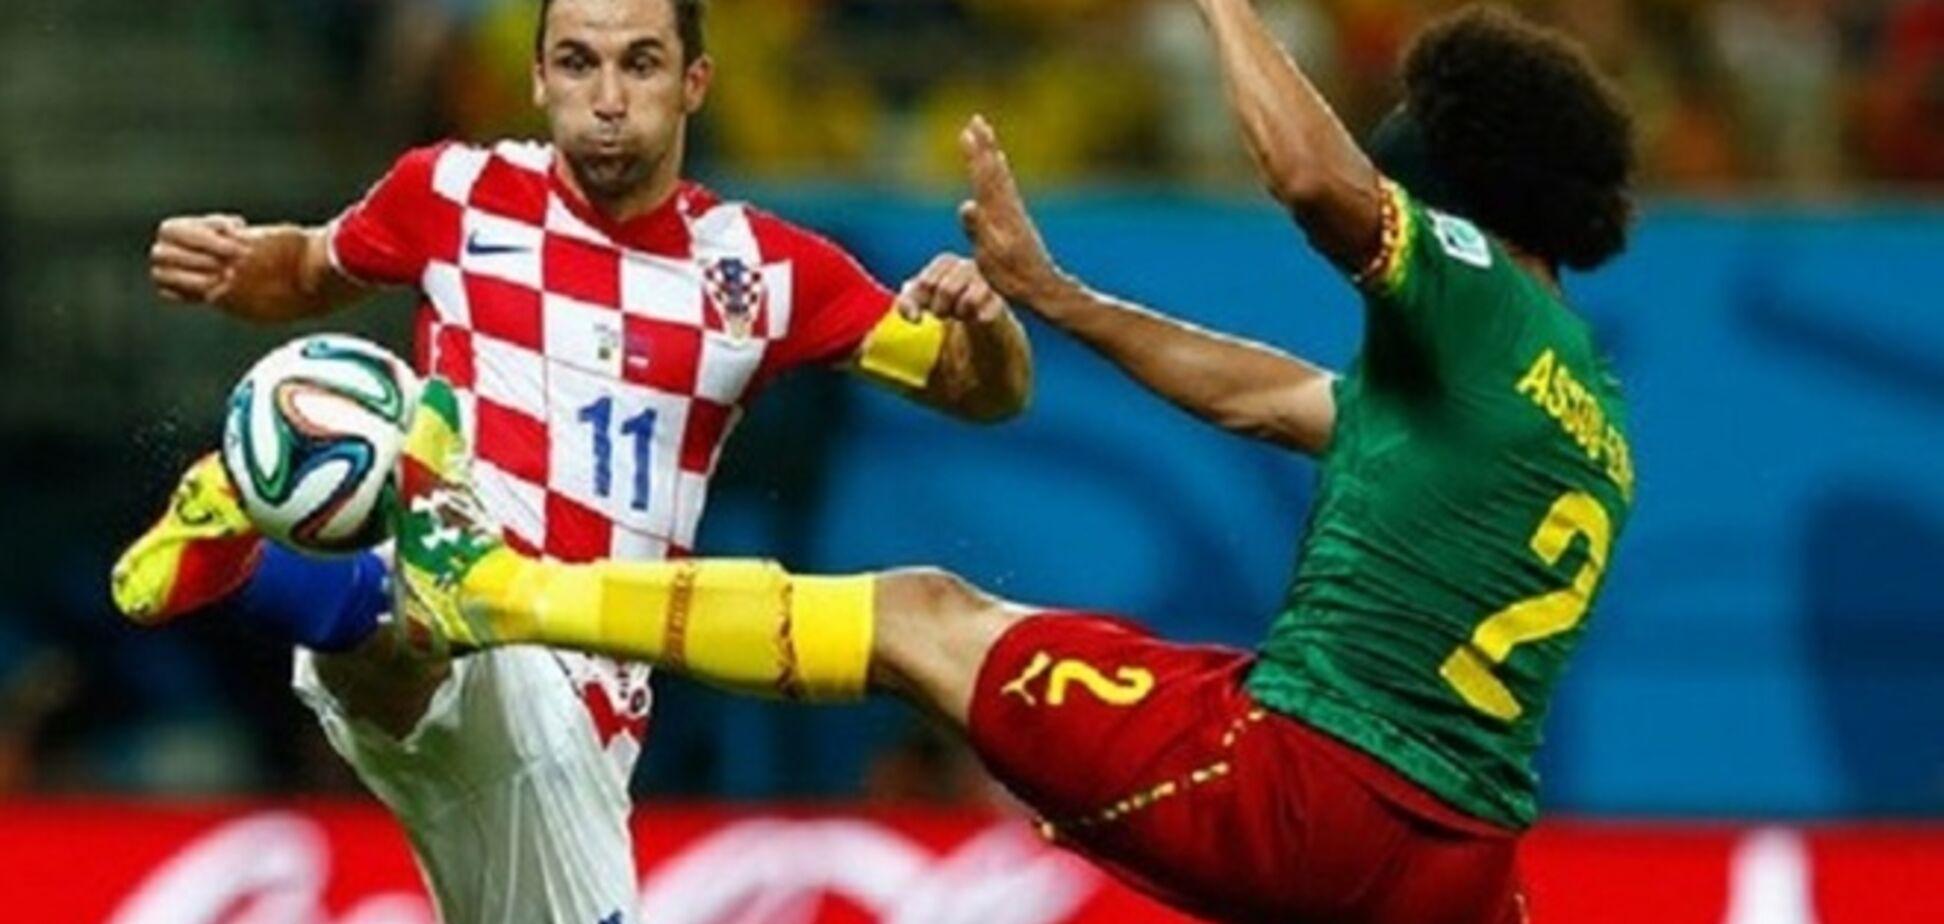 'Шахтер' получил от ФИФА $300 тысяч компенсации